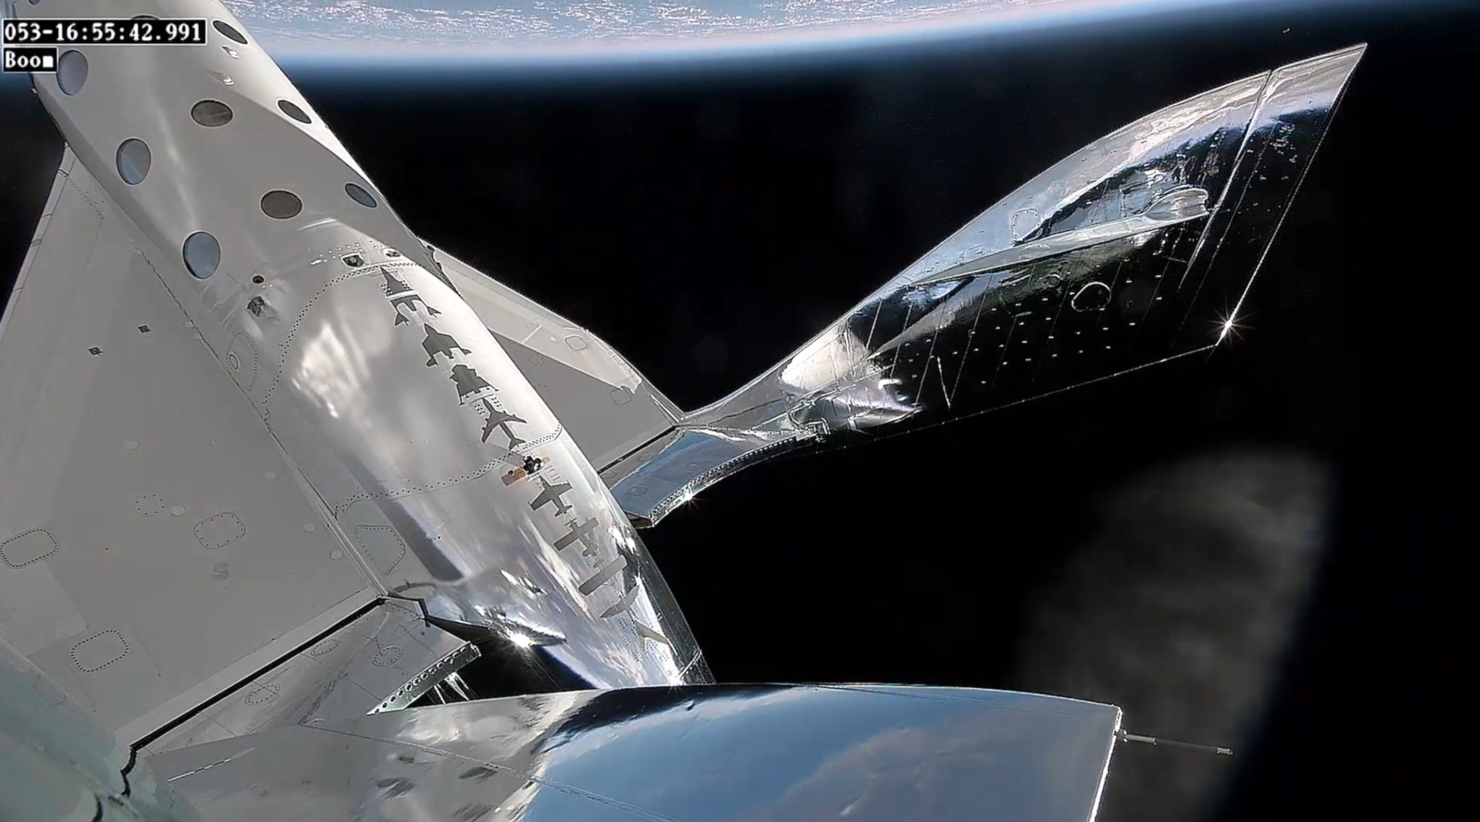 spaceshiptwo-adjust-high-altitude